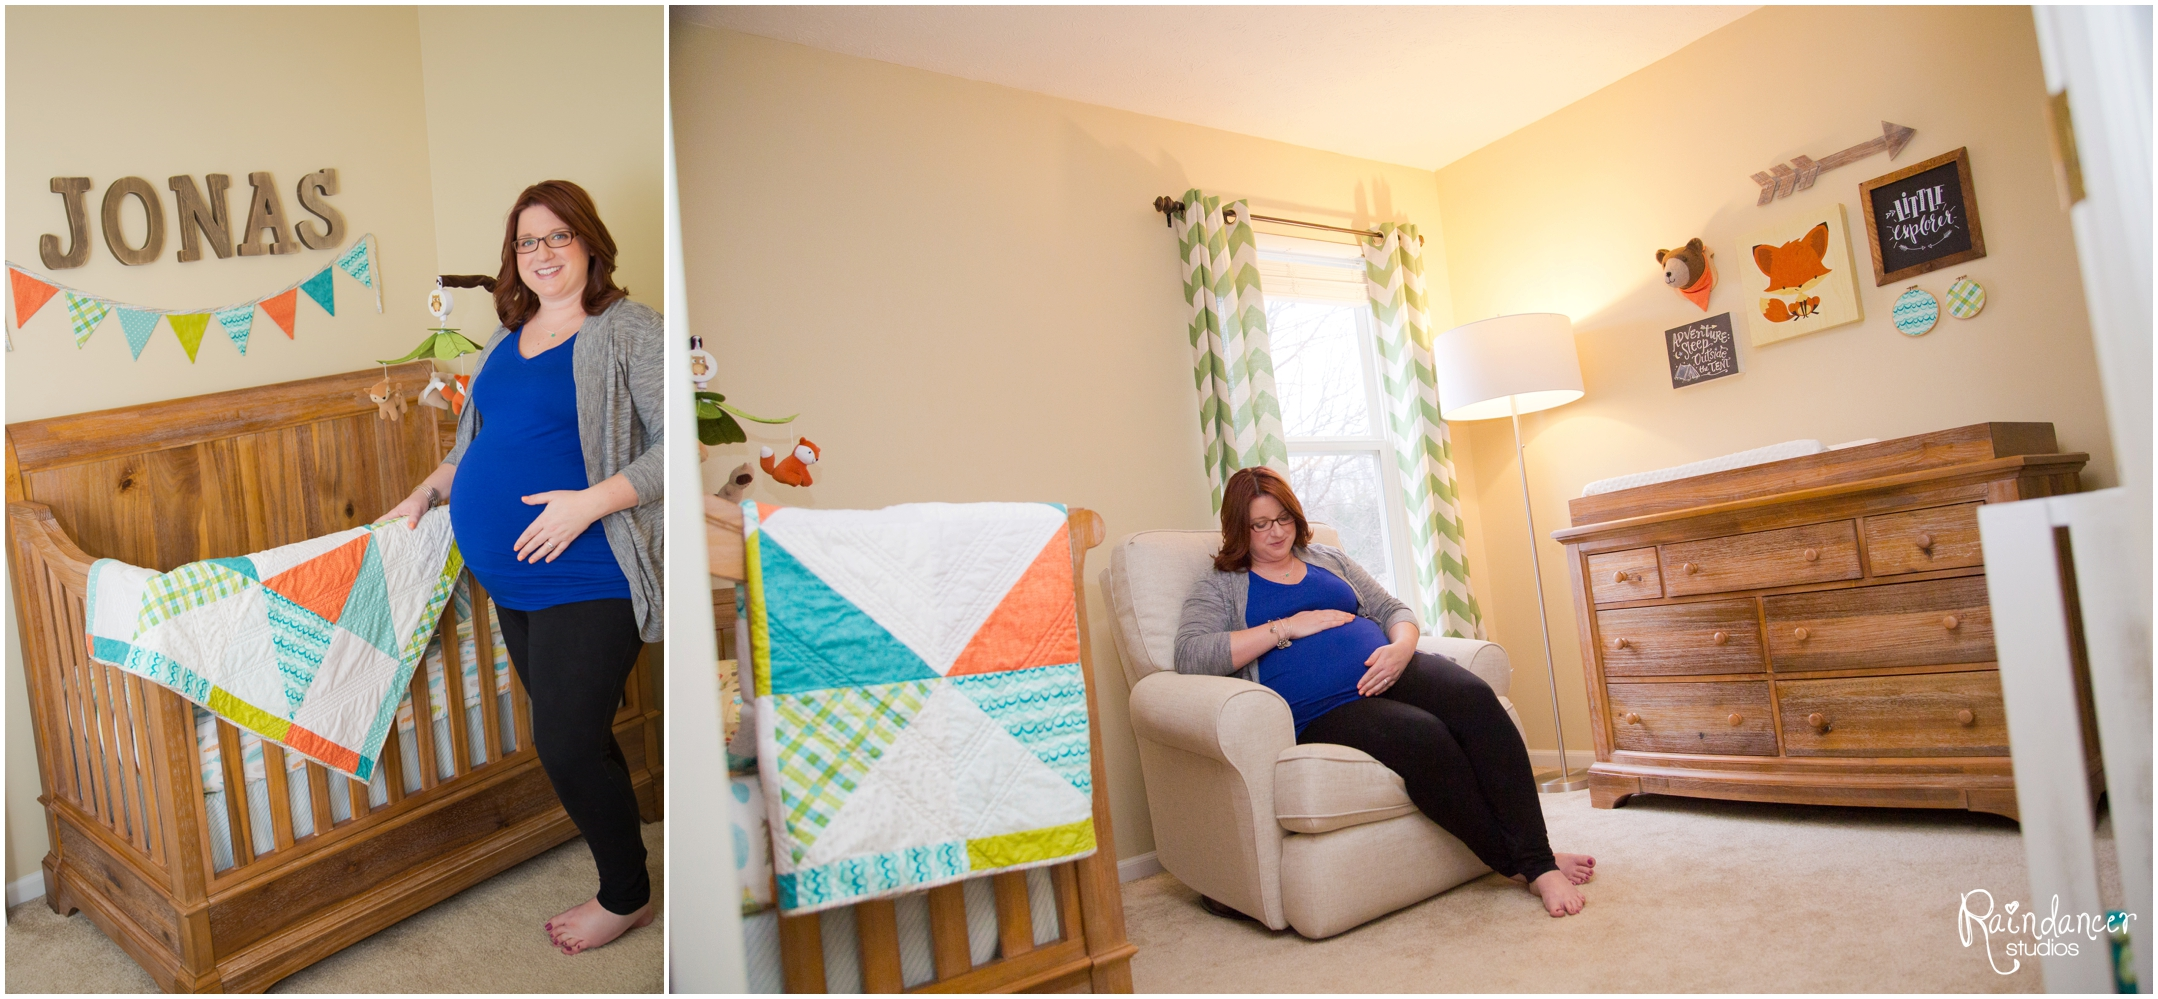 Indianapolis Maternity photographer, Indy maternity photographer,Indy maternity photography, Indianapolis maternity photography, Indianapolis lifestyle photographer, Indianapolis lifestyle photography, Indianapolis newborn photographer, Indy newborn photographer